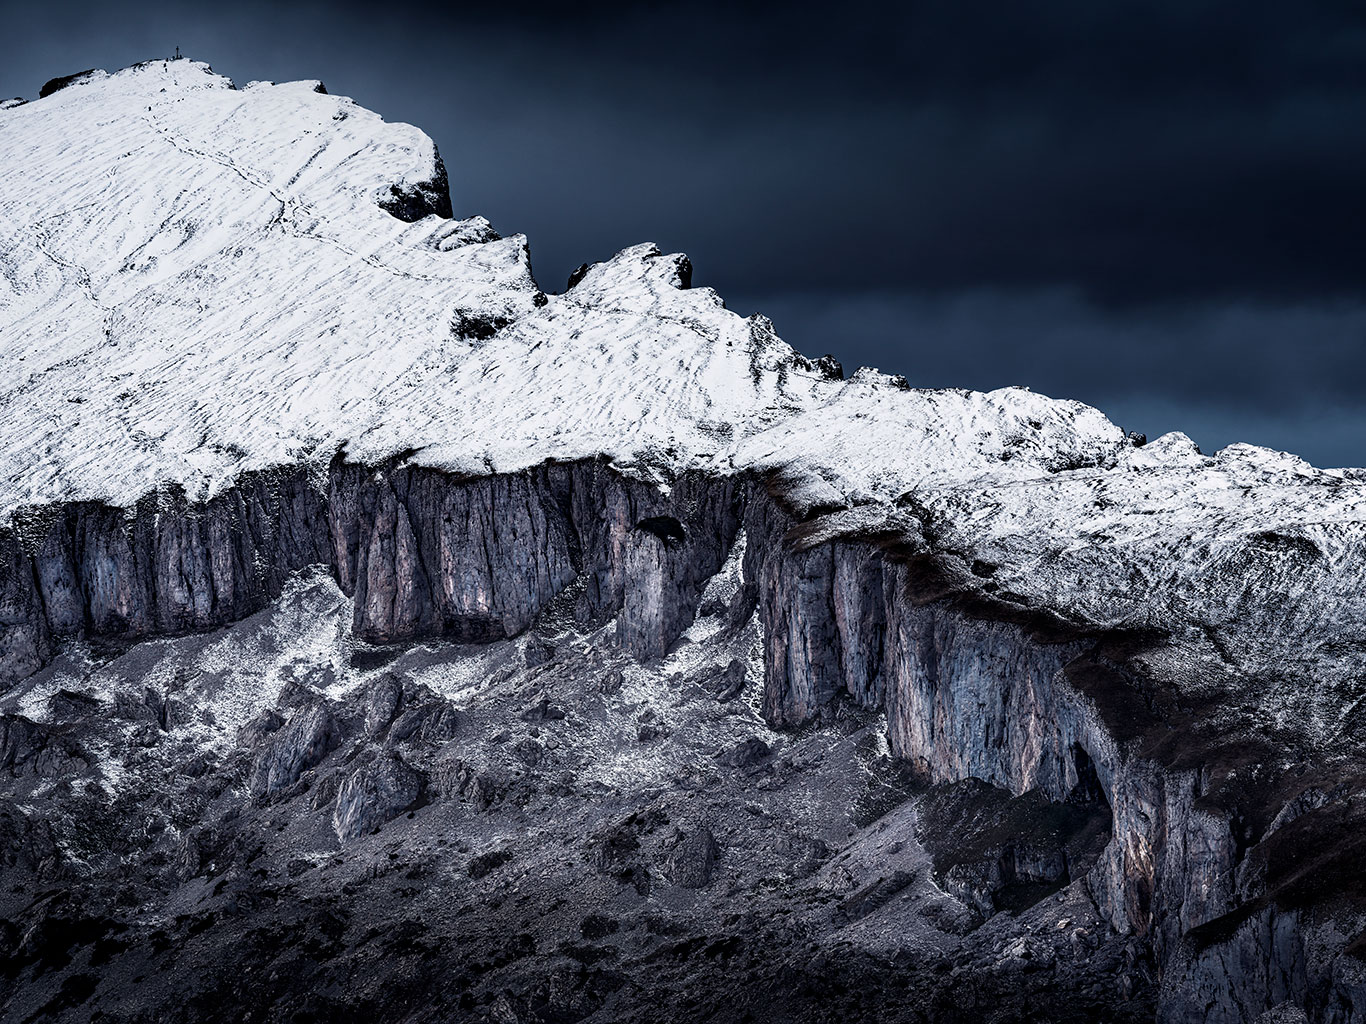 Harry_Koester_Alpen_Landschaftsfotografie_Ifen_Kleinwalsertal_03